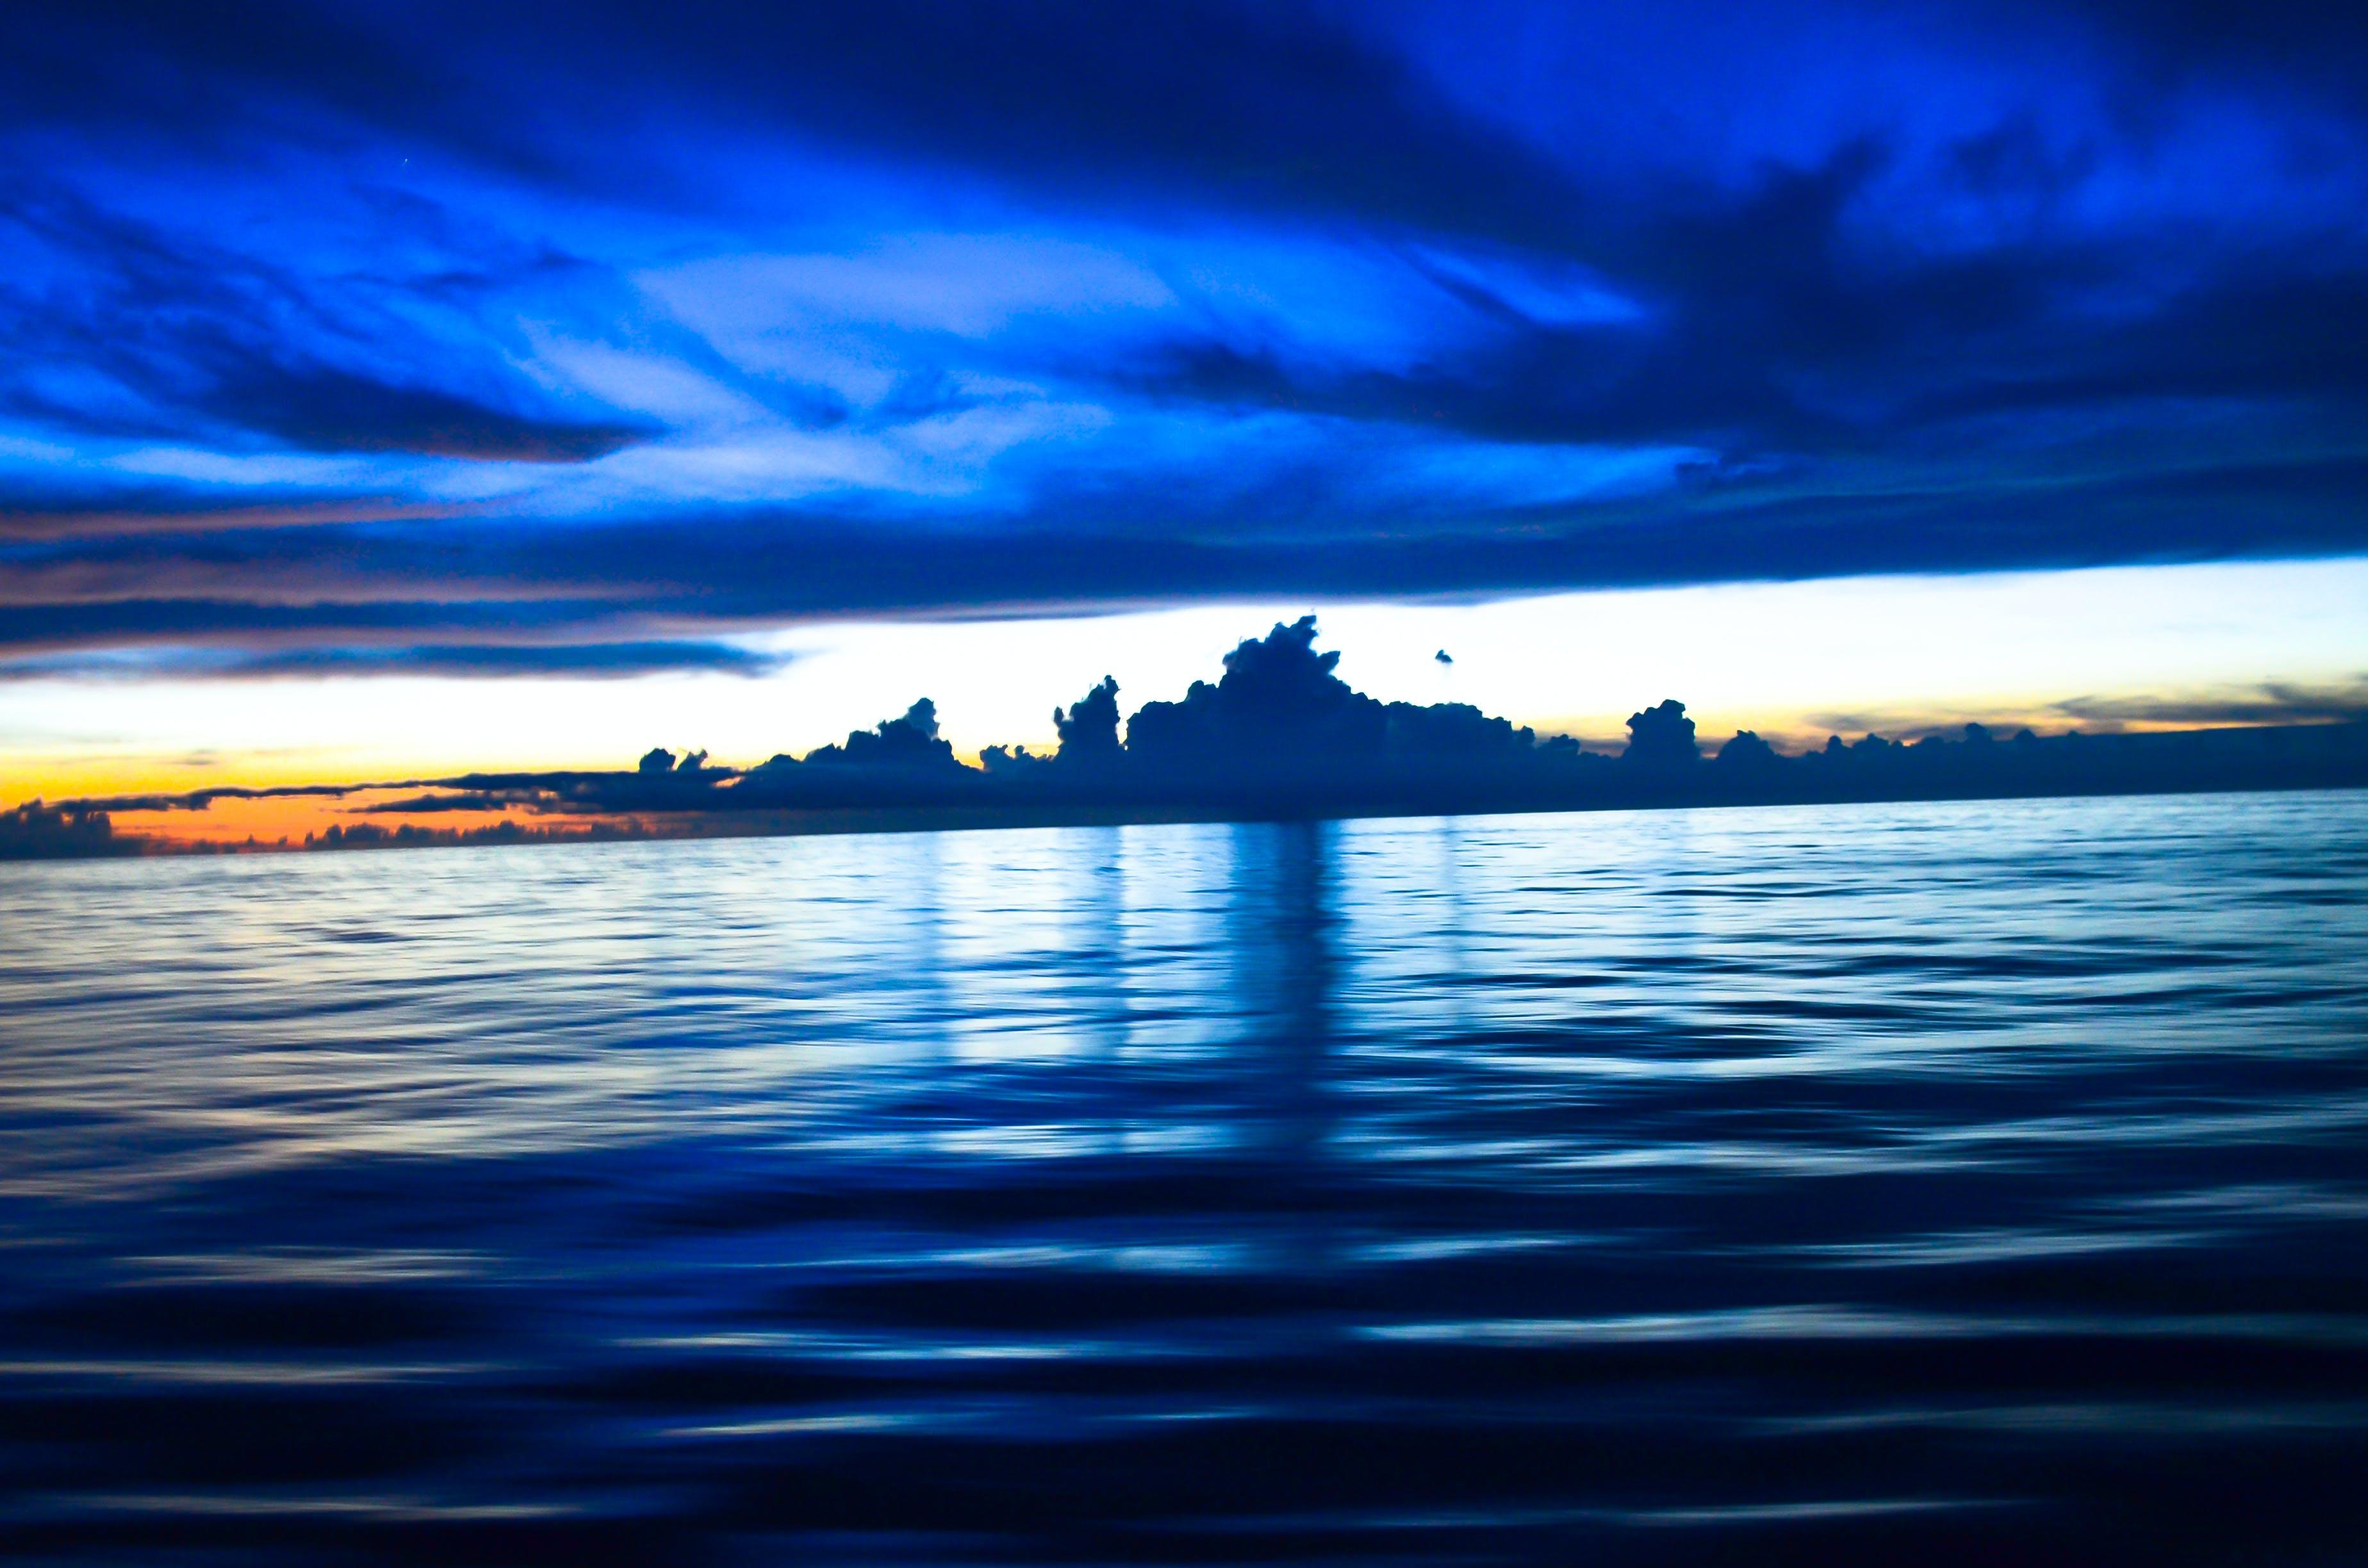 Free stock photo of mid sea